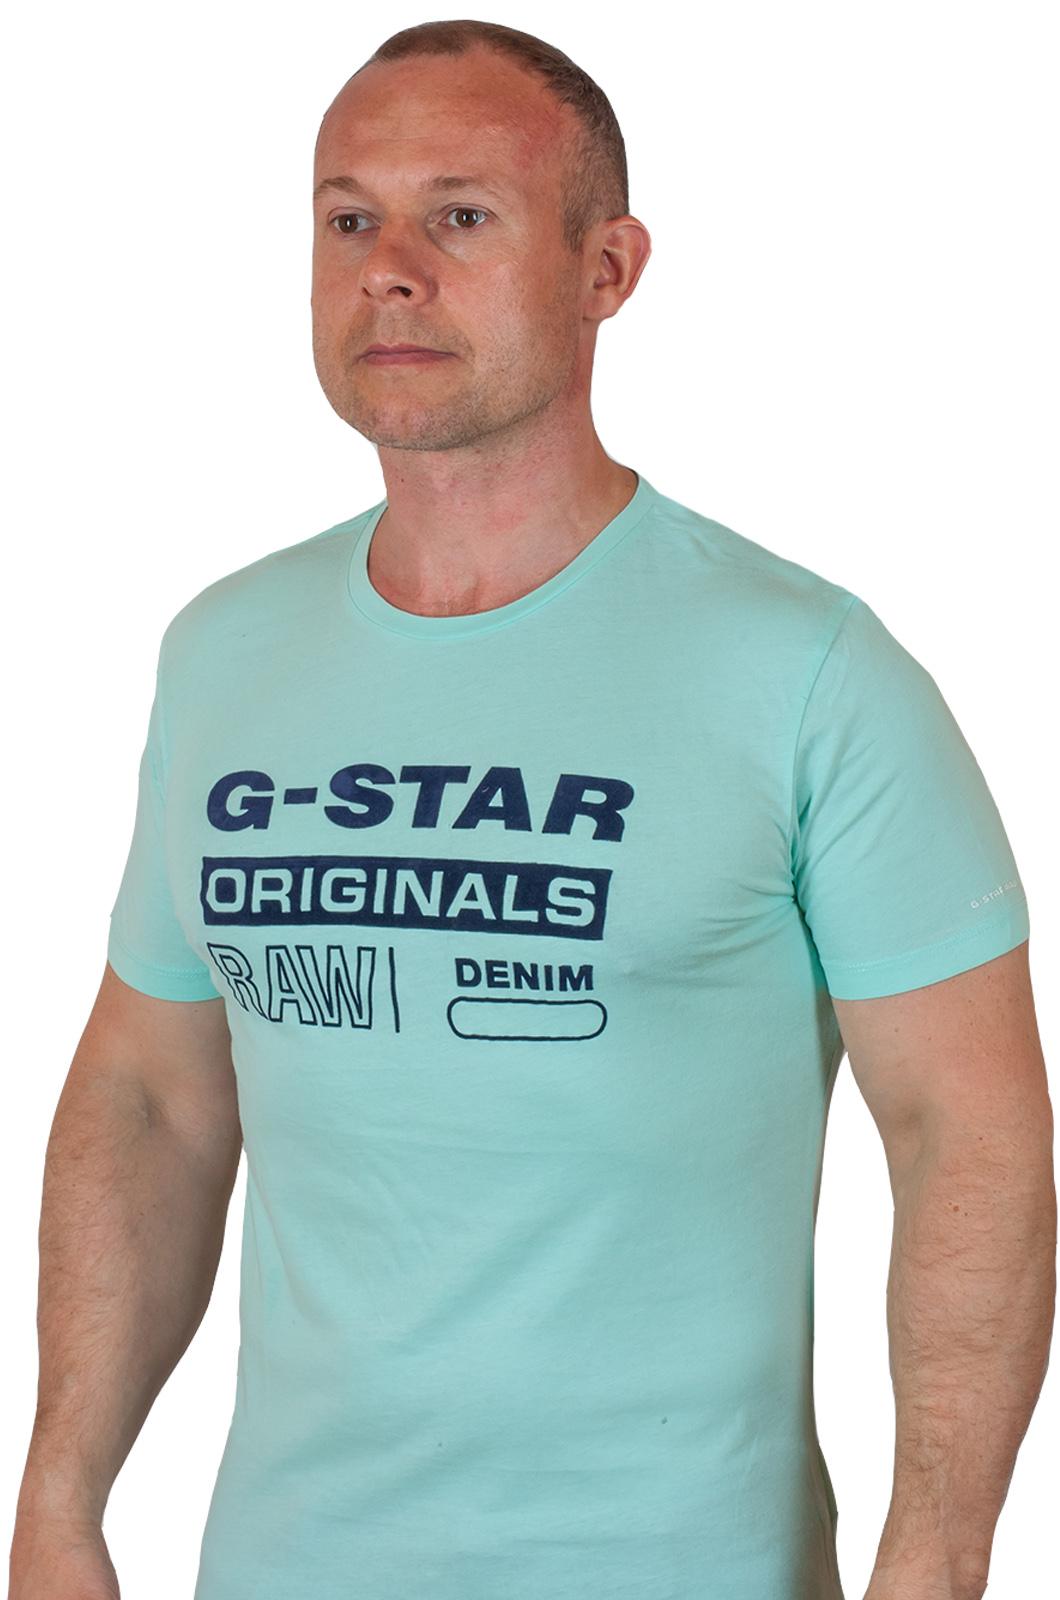 Мужская футболка для свежего образа G-Star Raw®